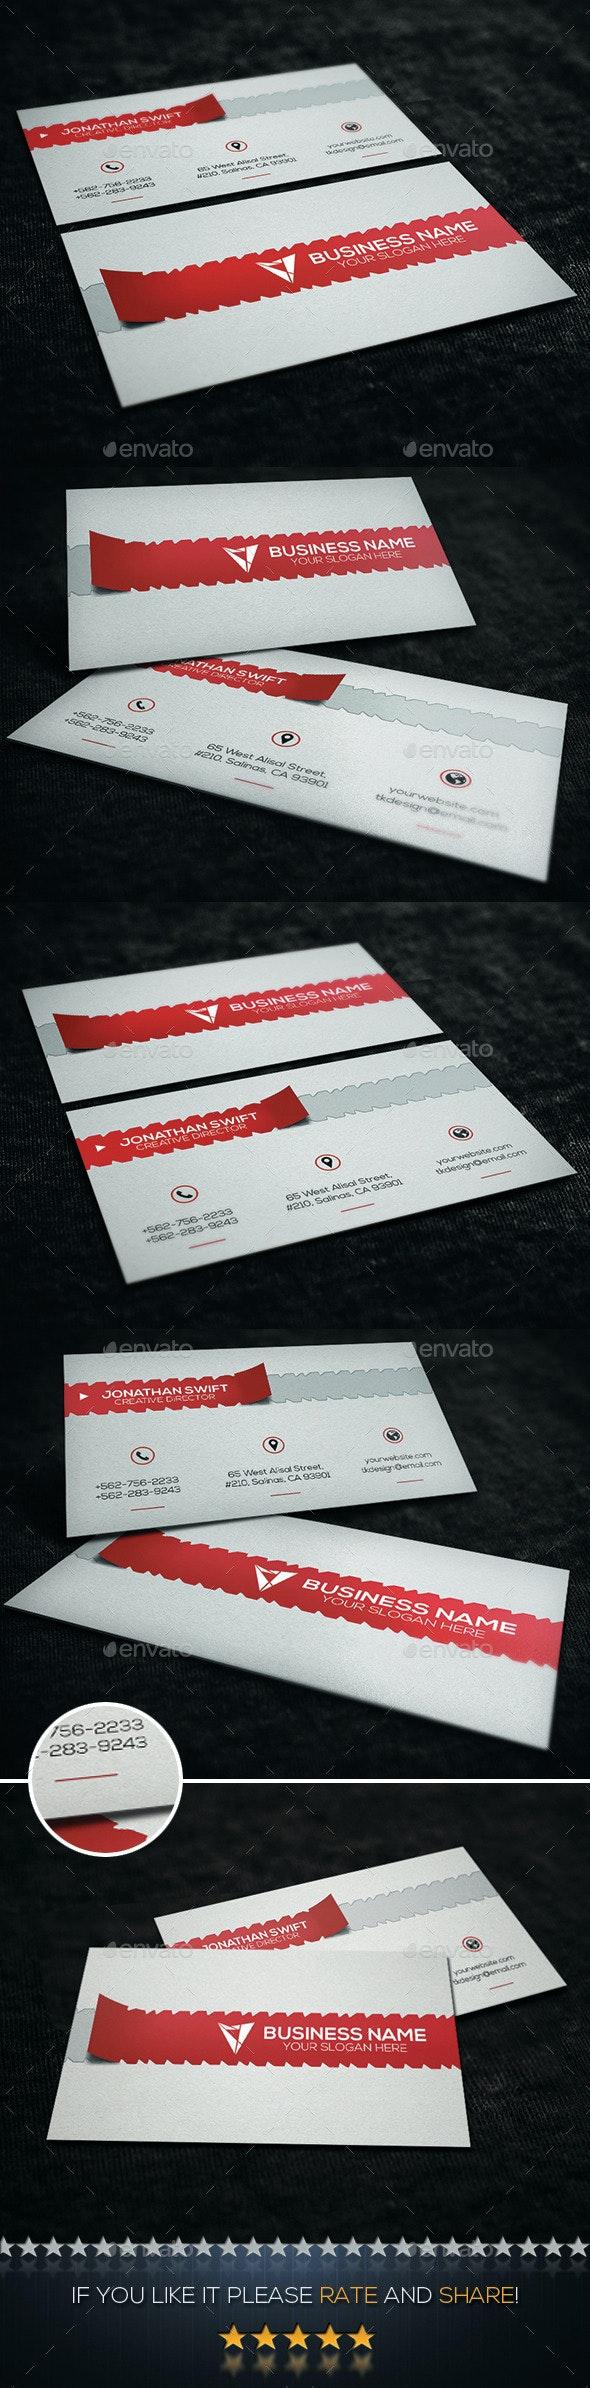 Creative Business Card No.09 - Creative Business Cards